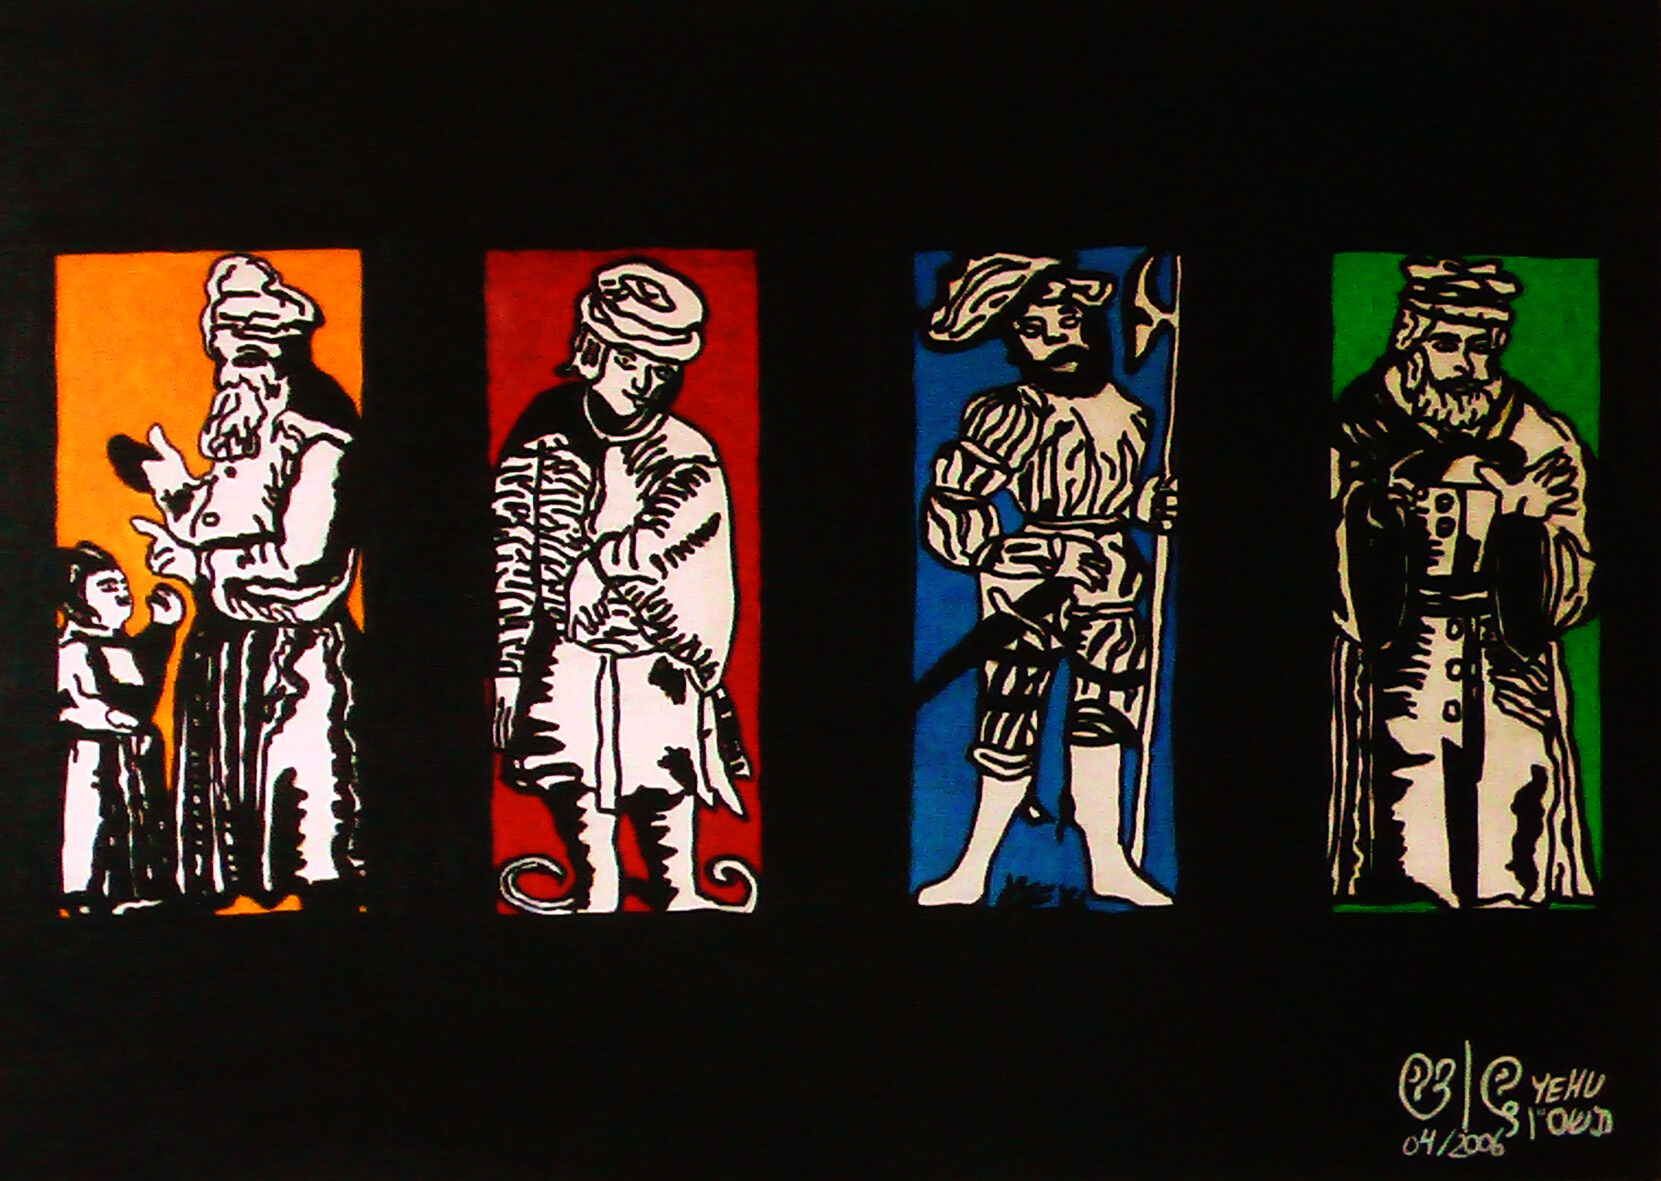 colored woodcut illustration